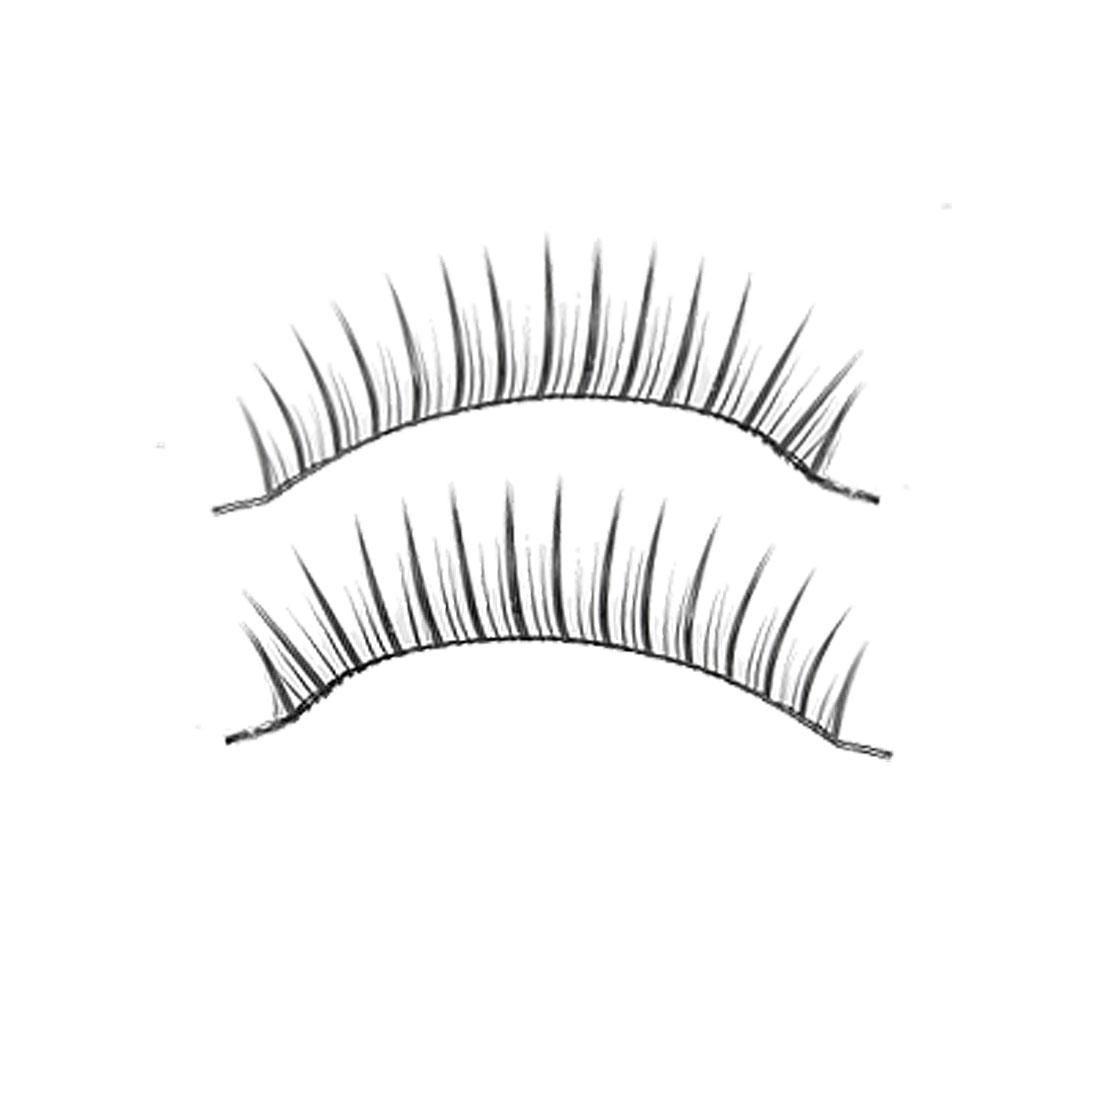 Long Thick False Eyelashes Fake Lashes Extension 10 Pairs